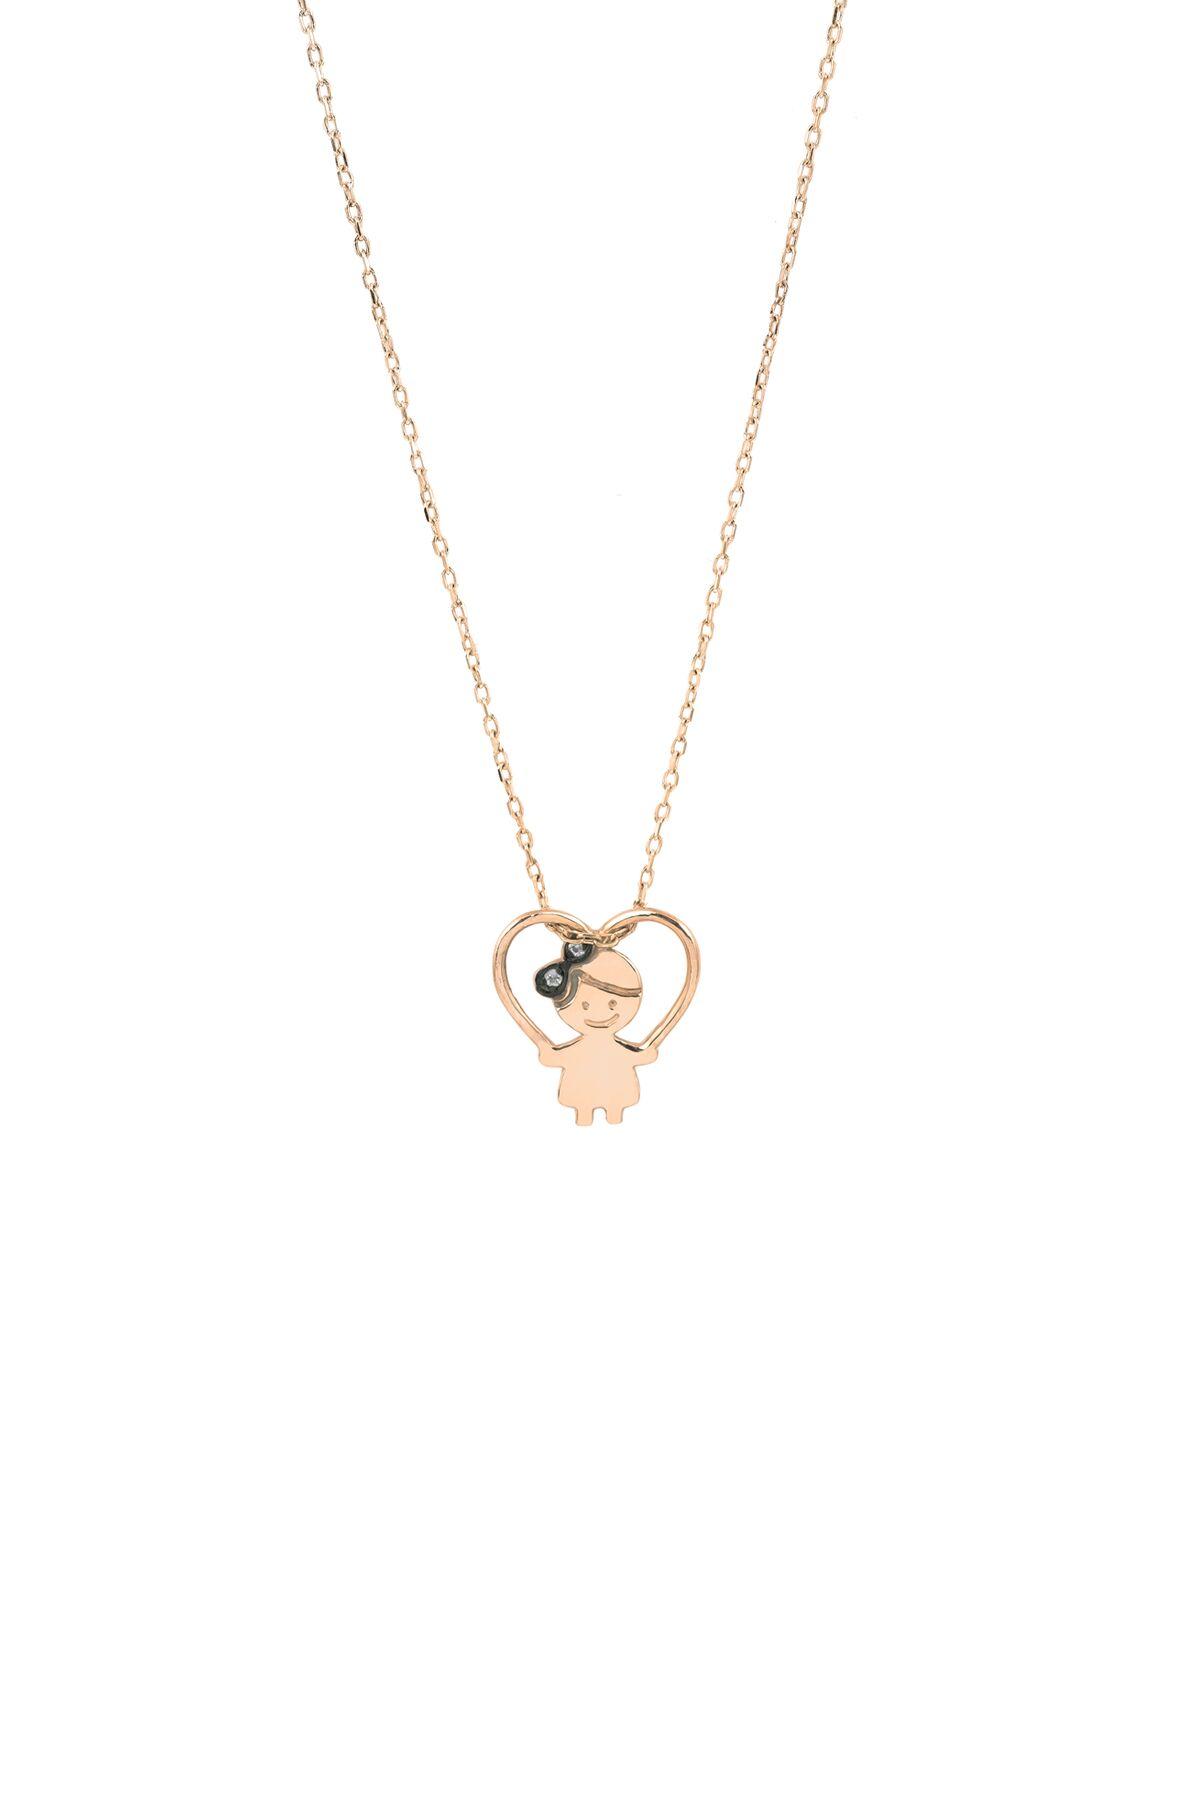 Lola In Love Girl Heart Necklace